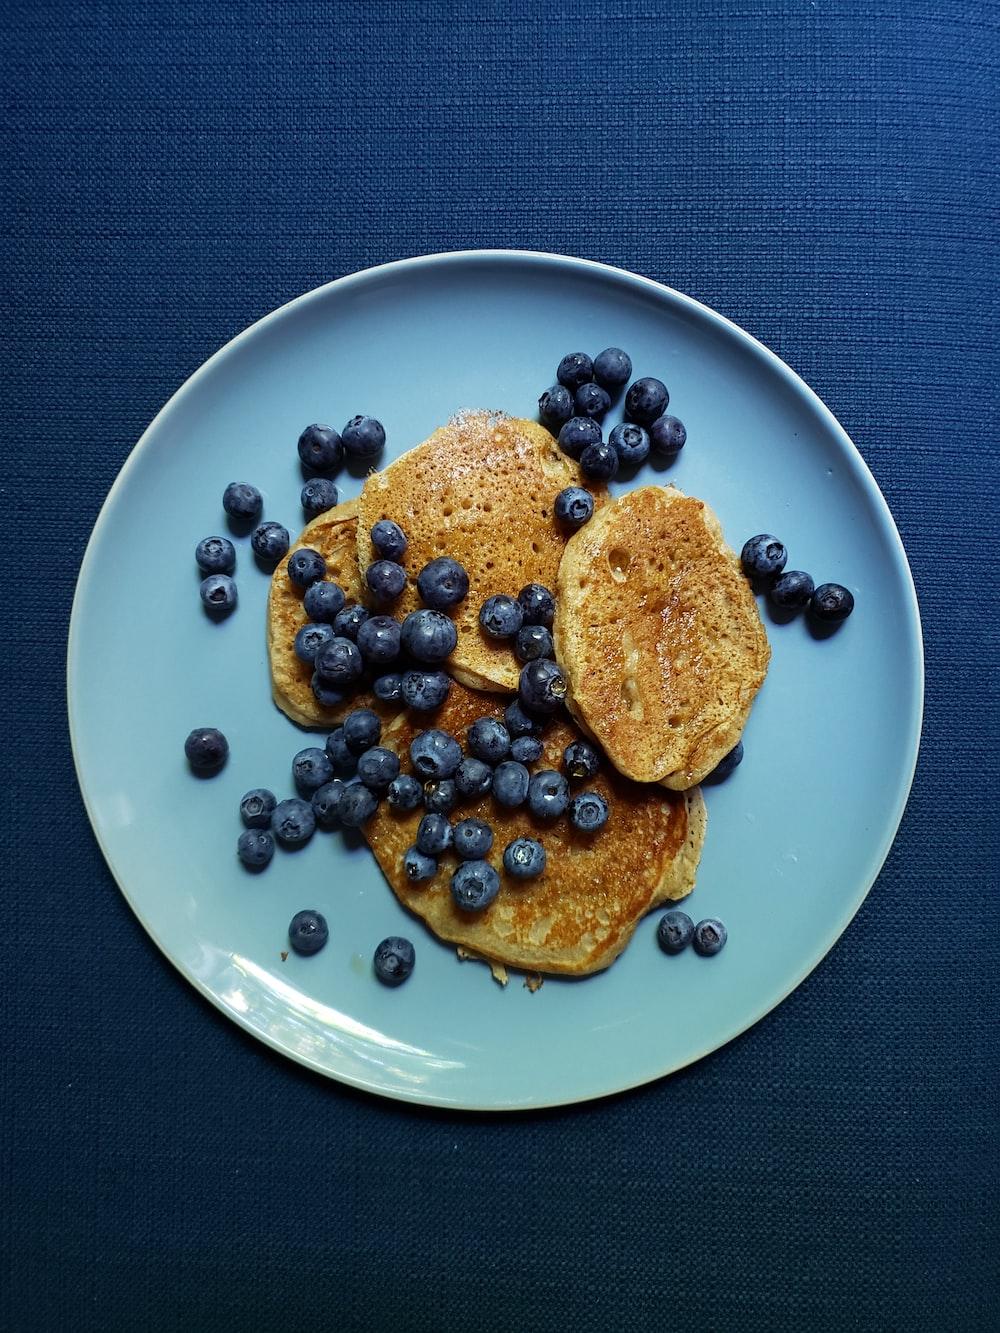 pancake and blueberries platter